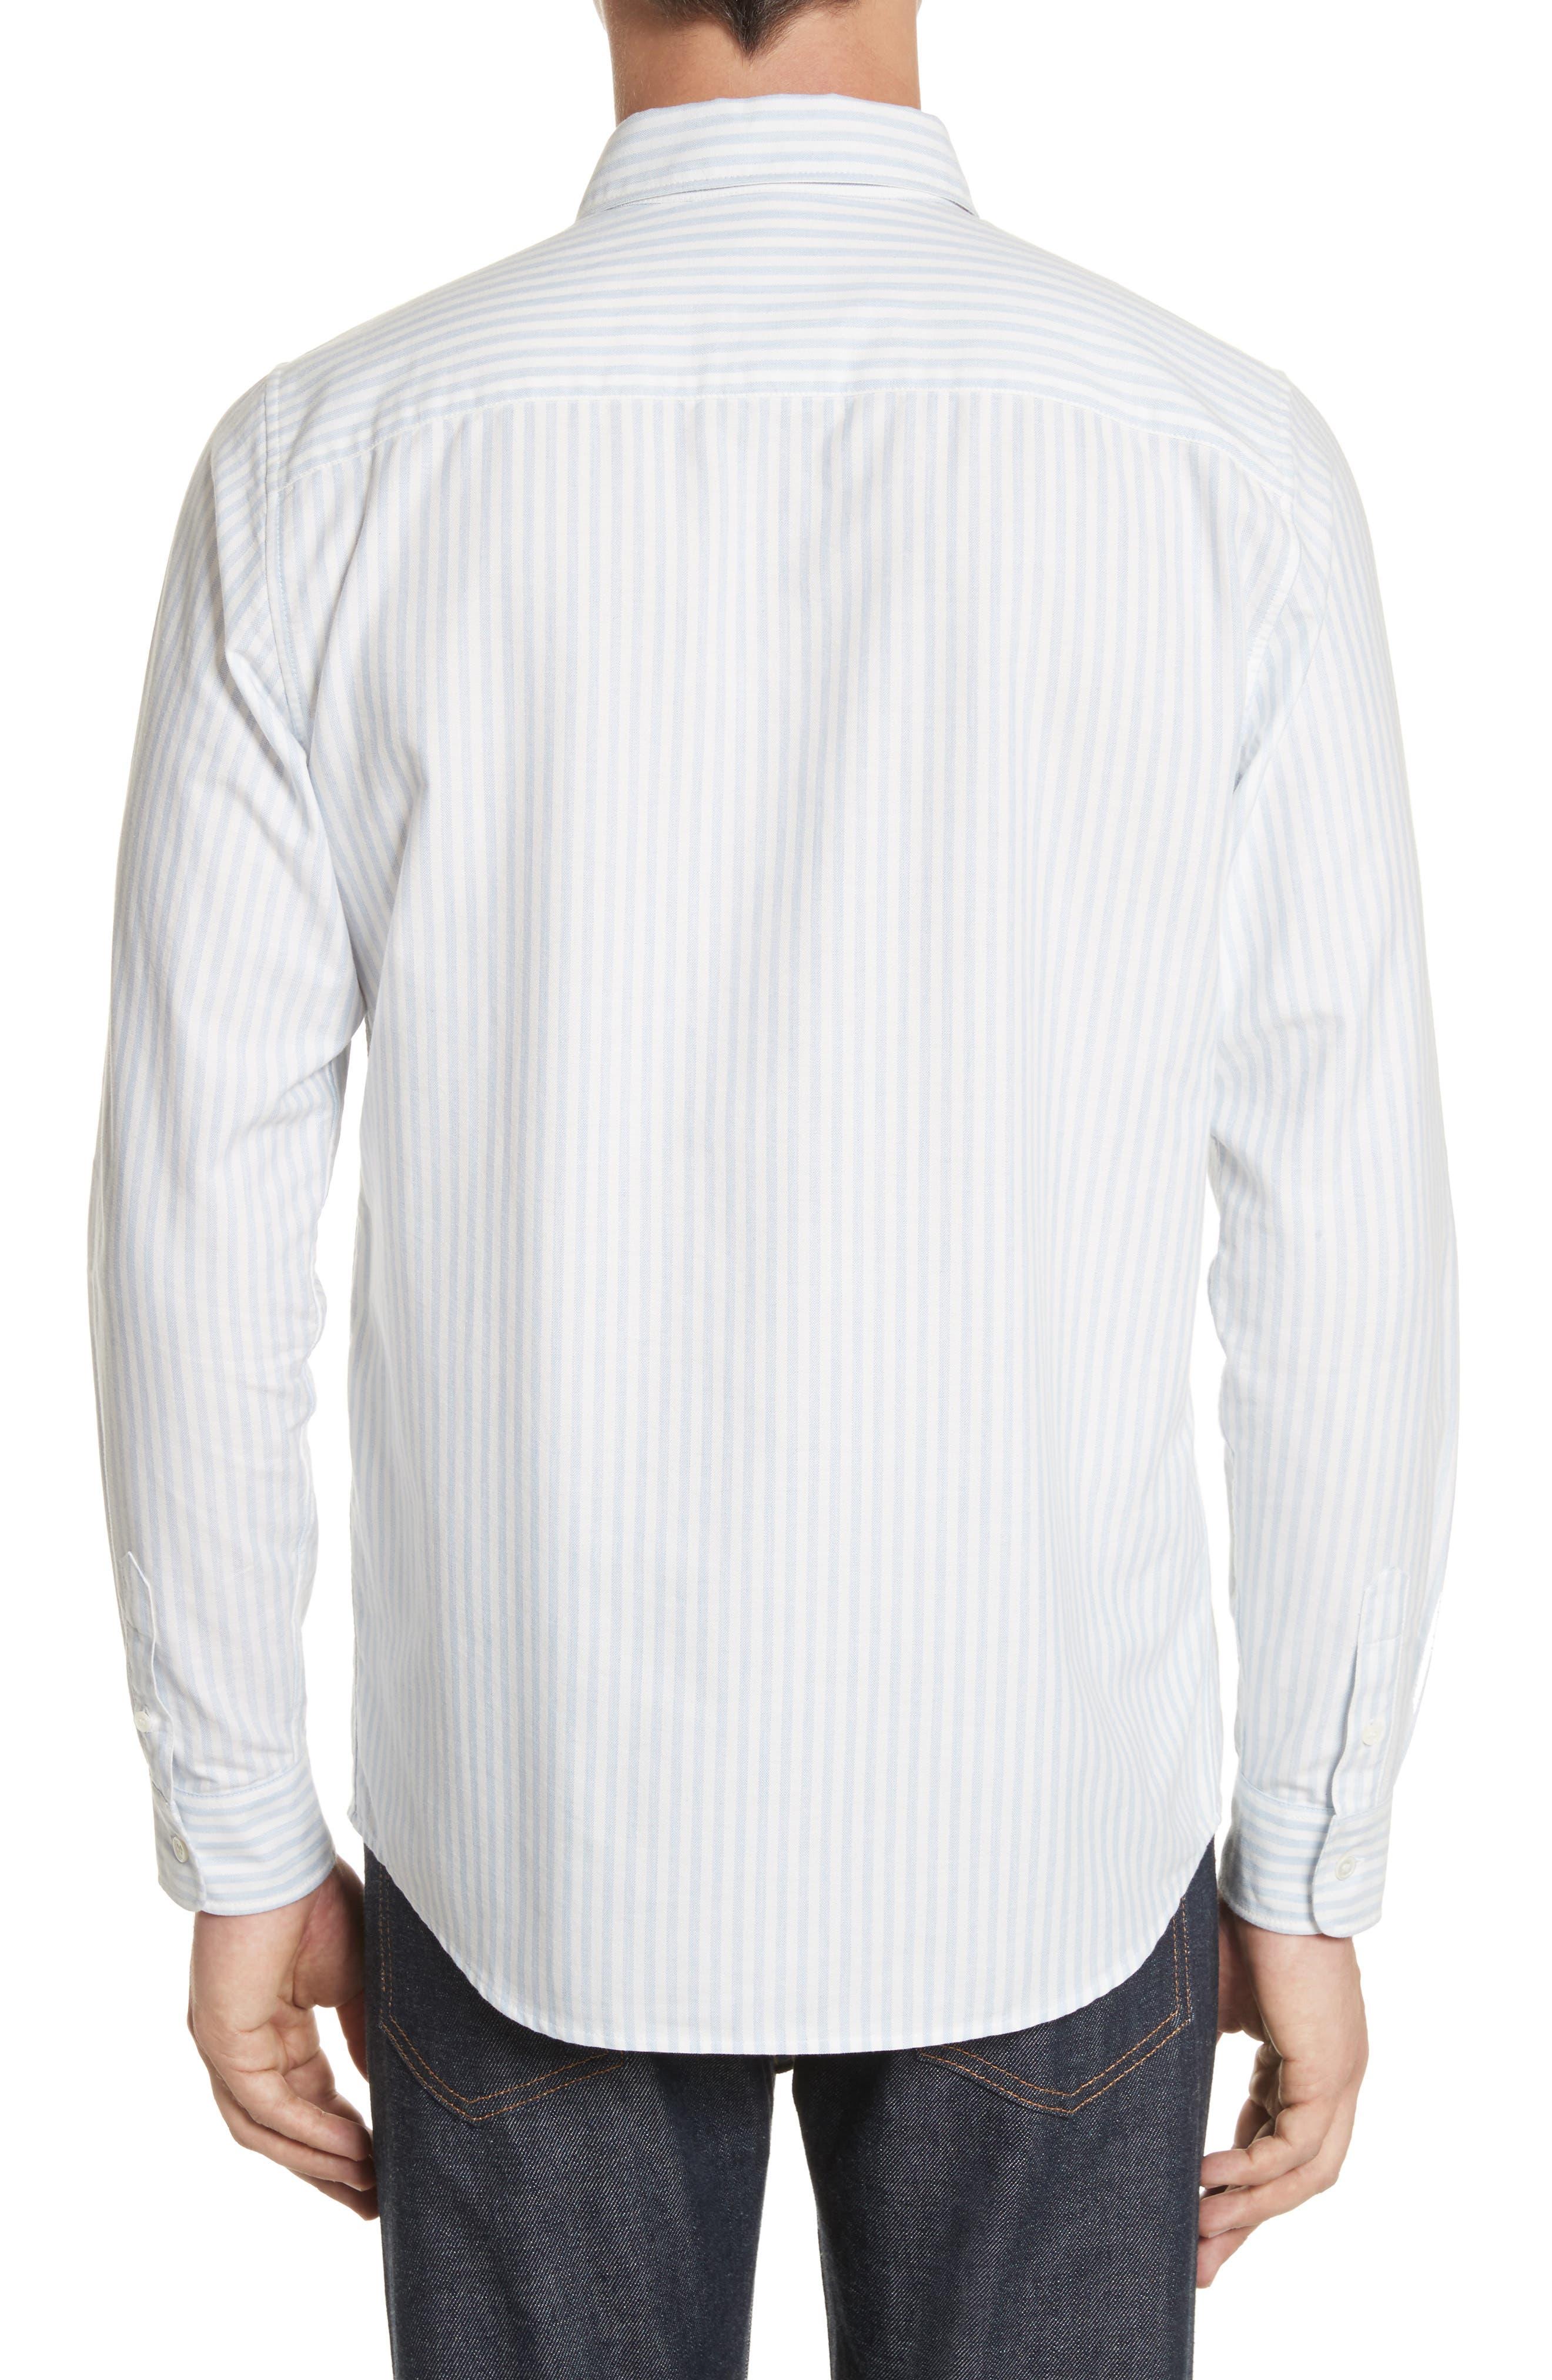 Oliver Stripe Oxford Shirt,                             Alternate thumbnail 2, color,                             430